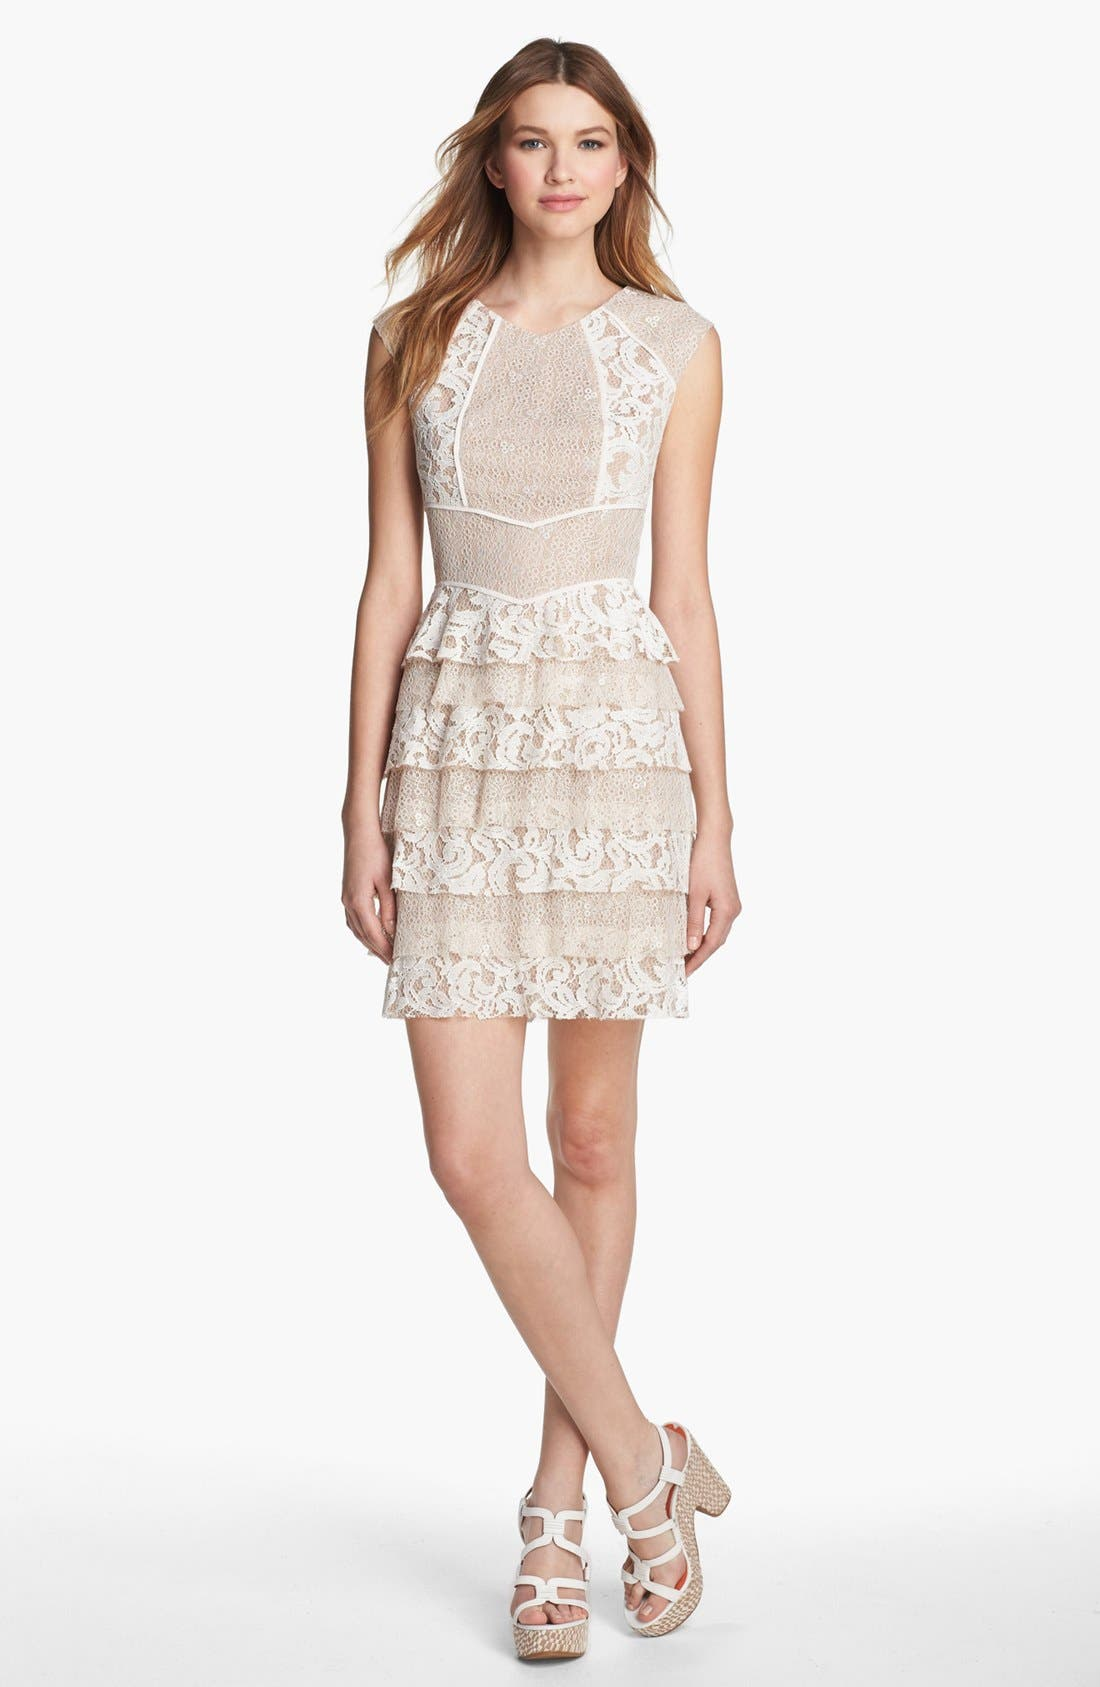 Alternate Image 1 Selected - BCBGMAXAZRIA Lace Panel Ruffle Dress (Petite)